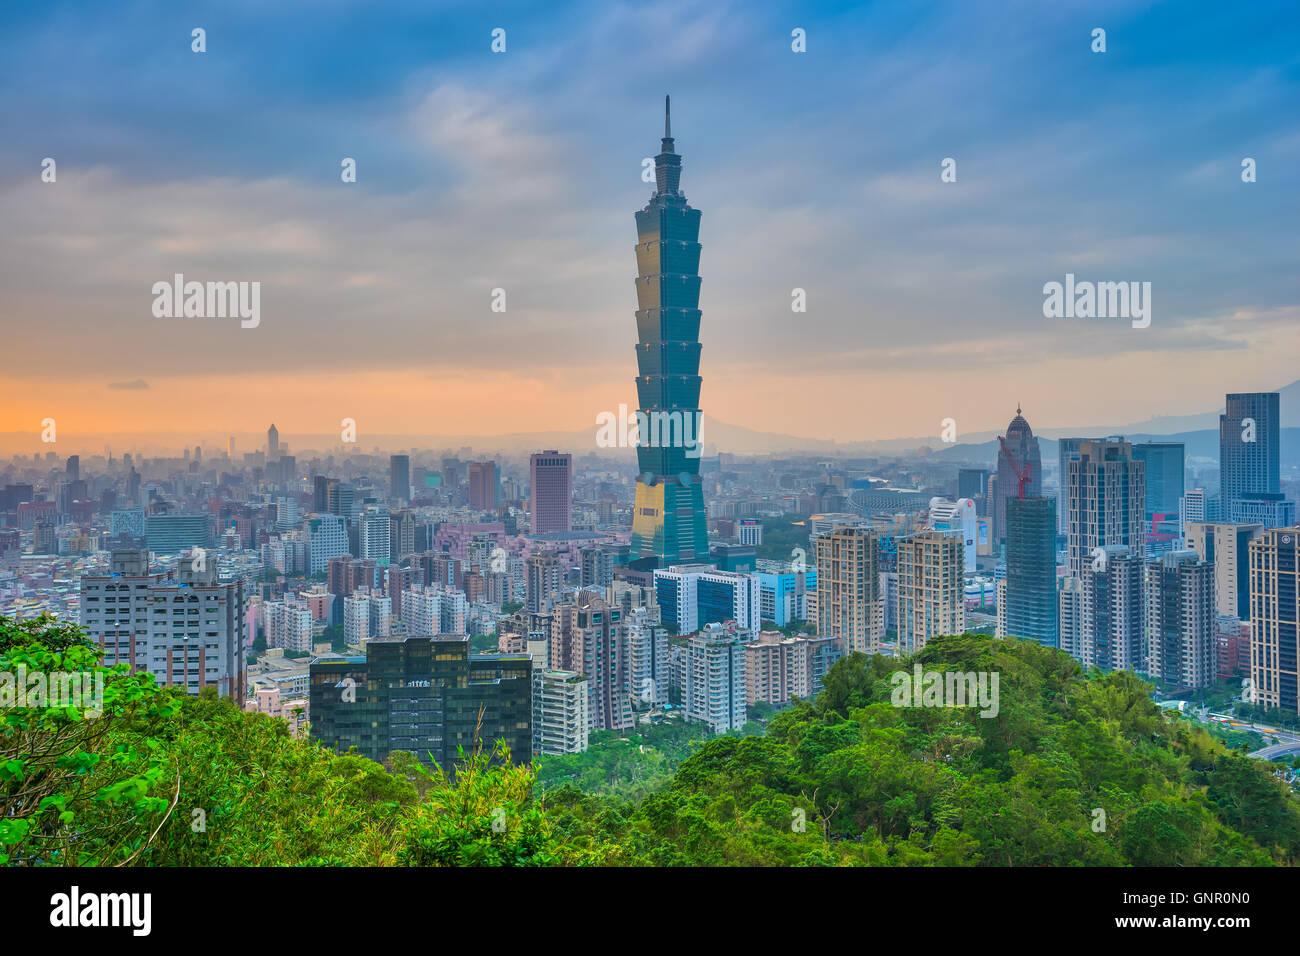 Taipei city skyline with sunset in Taiwan. - Stock Image